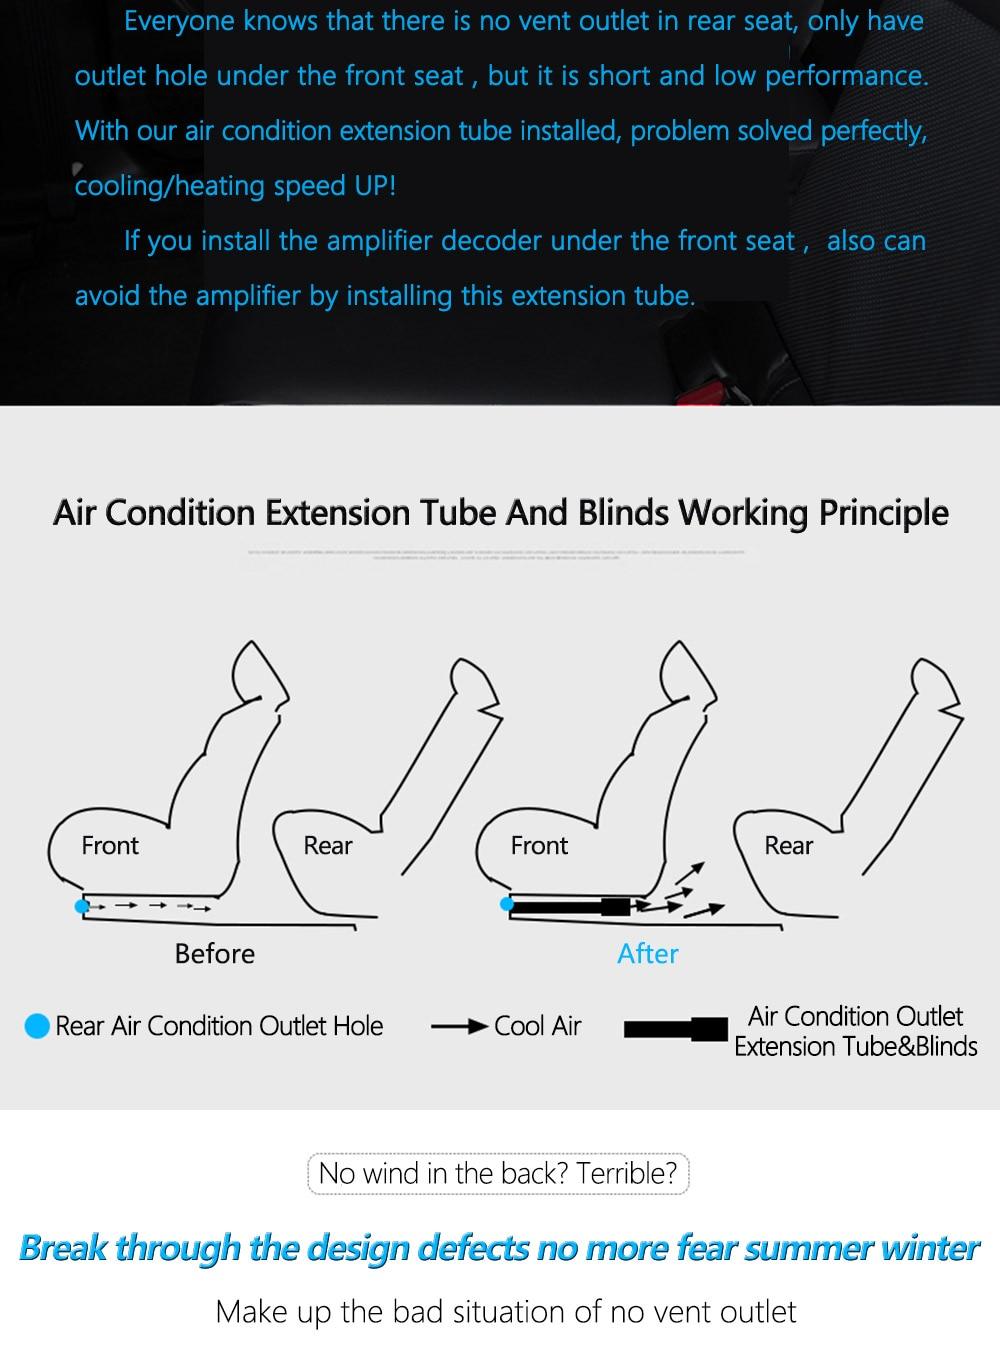 Subaru Impreza Wrx Intake Amp Exhaust Diagram The Official Blog Of